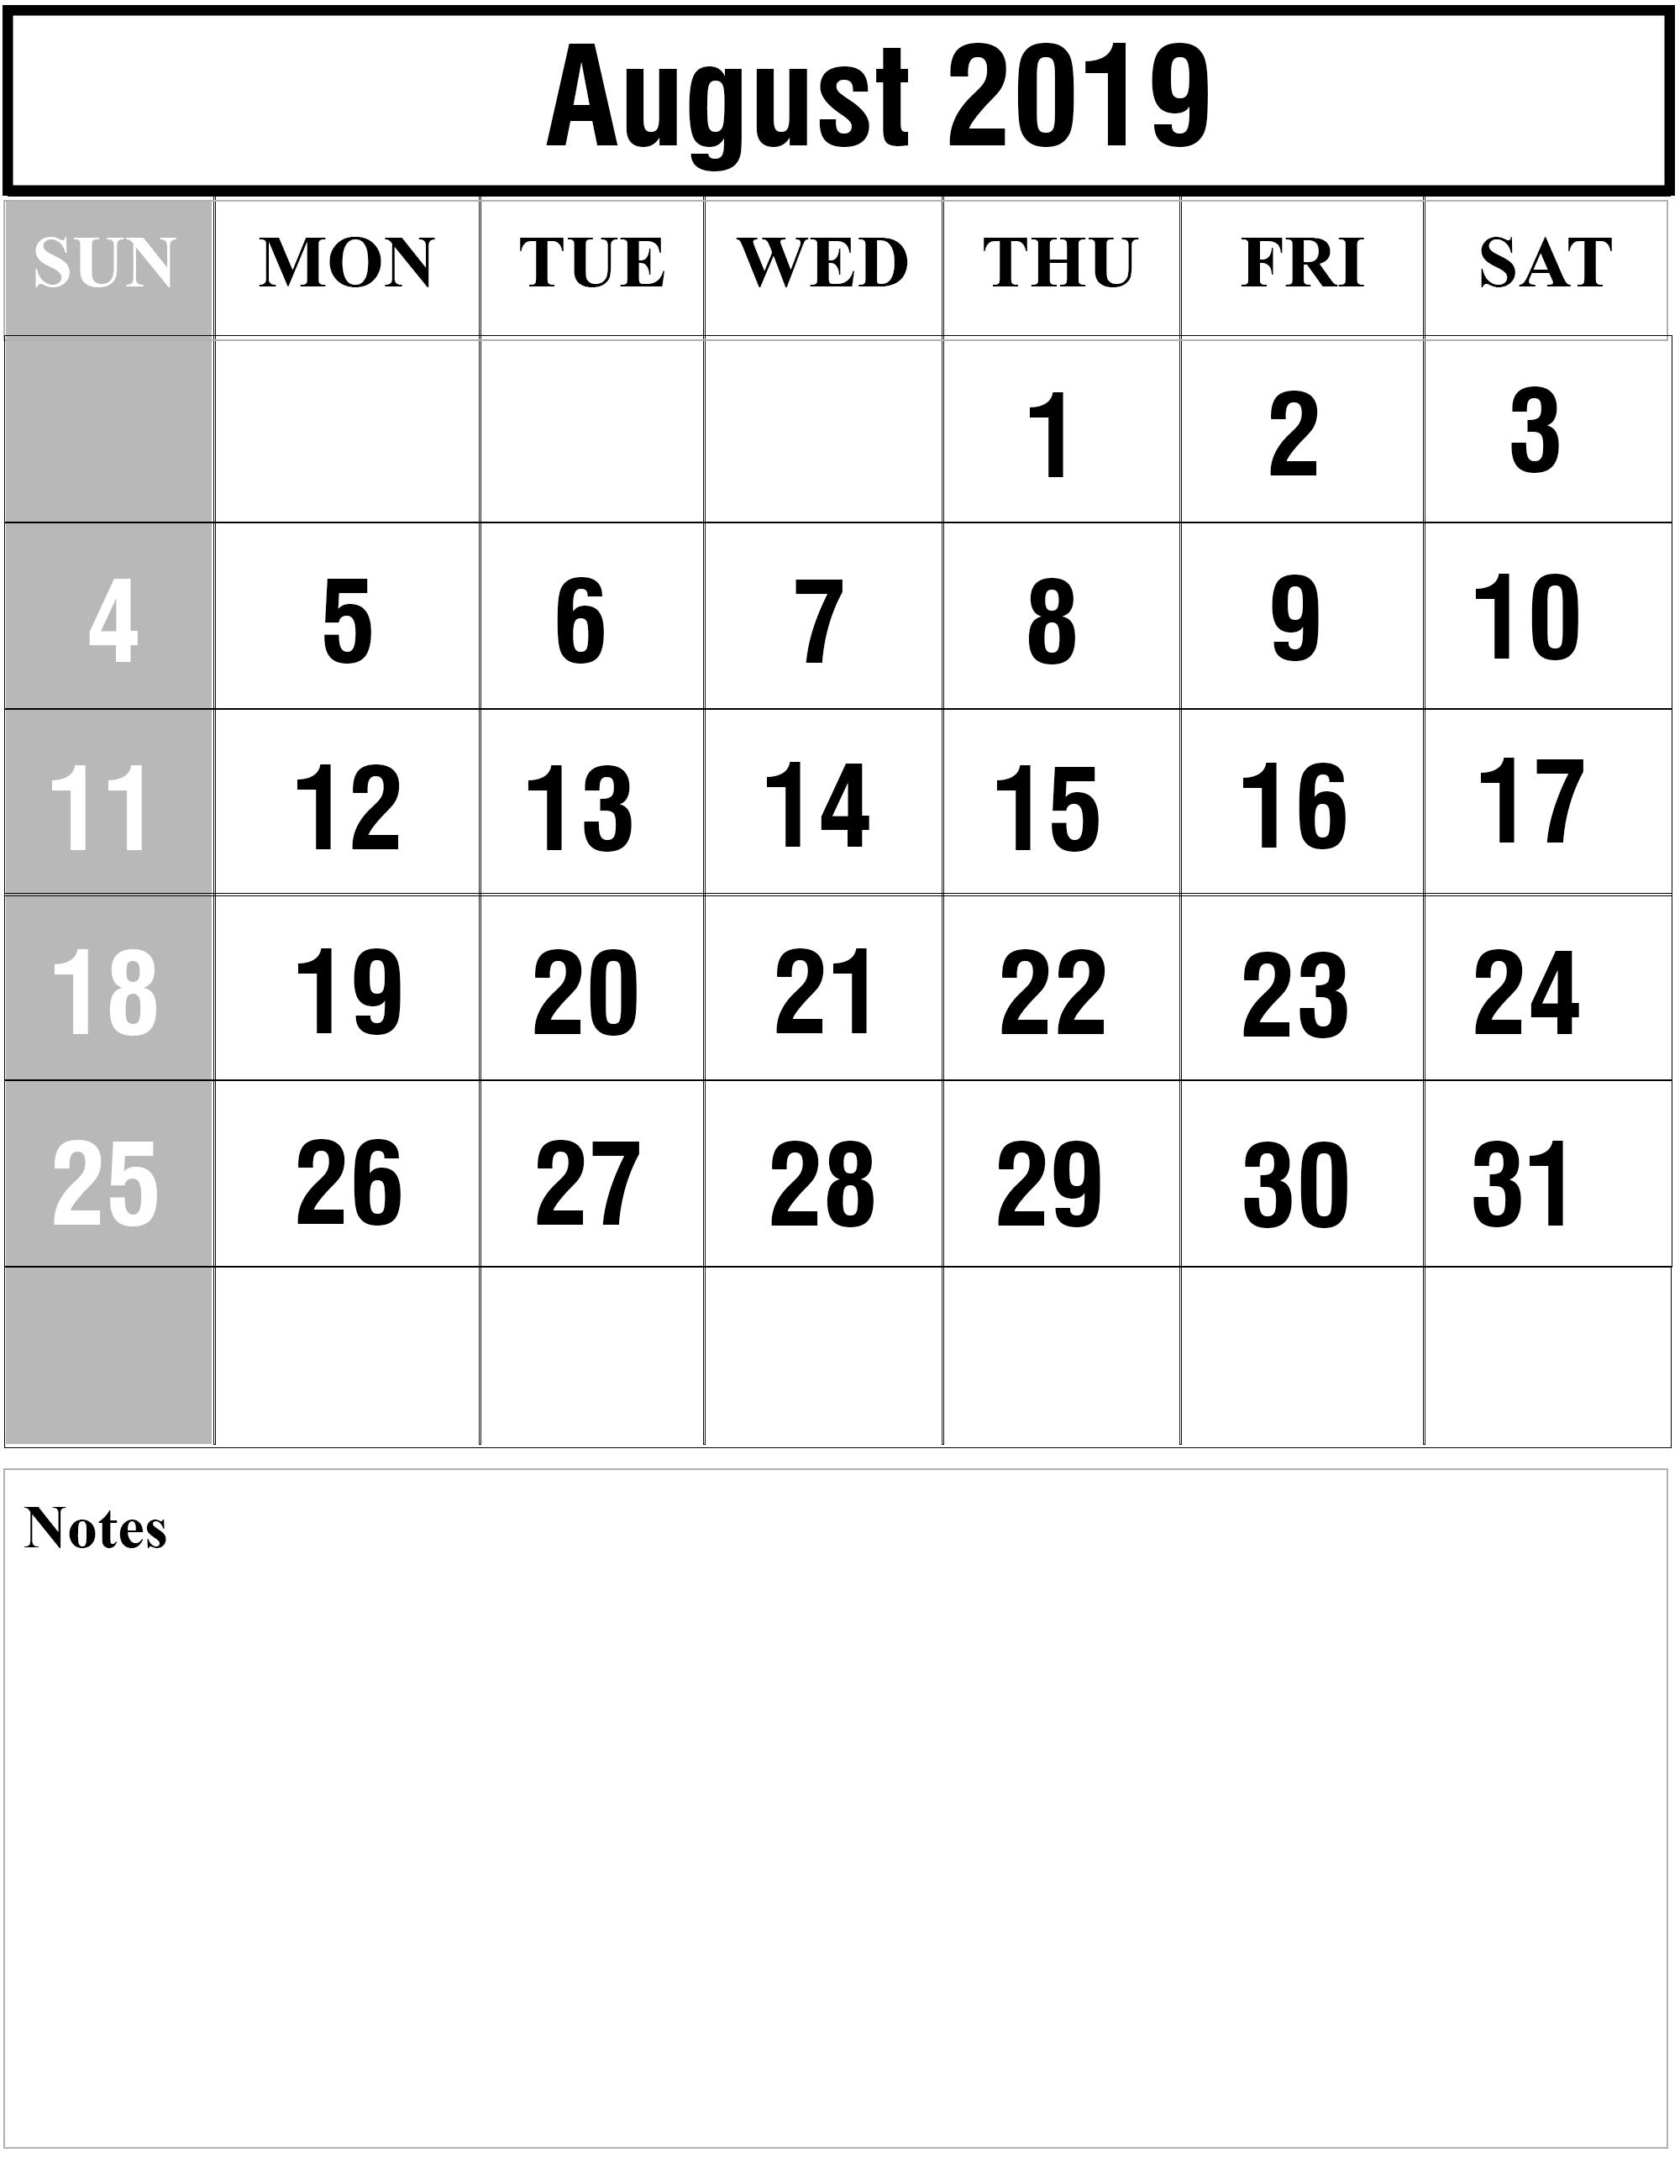 August 2019 Printable Calendar Page